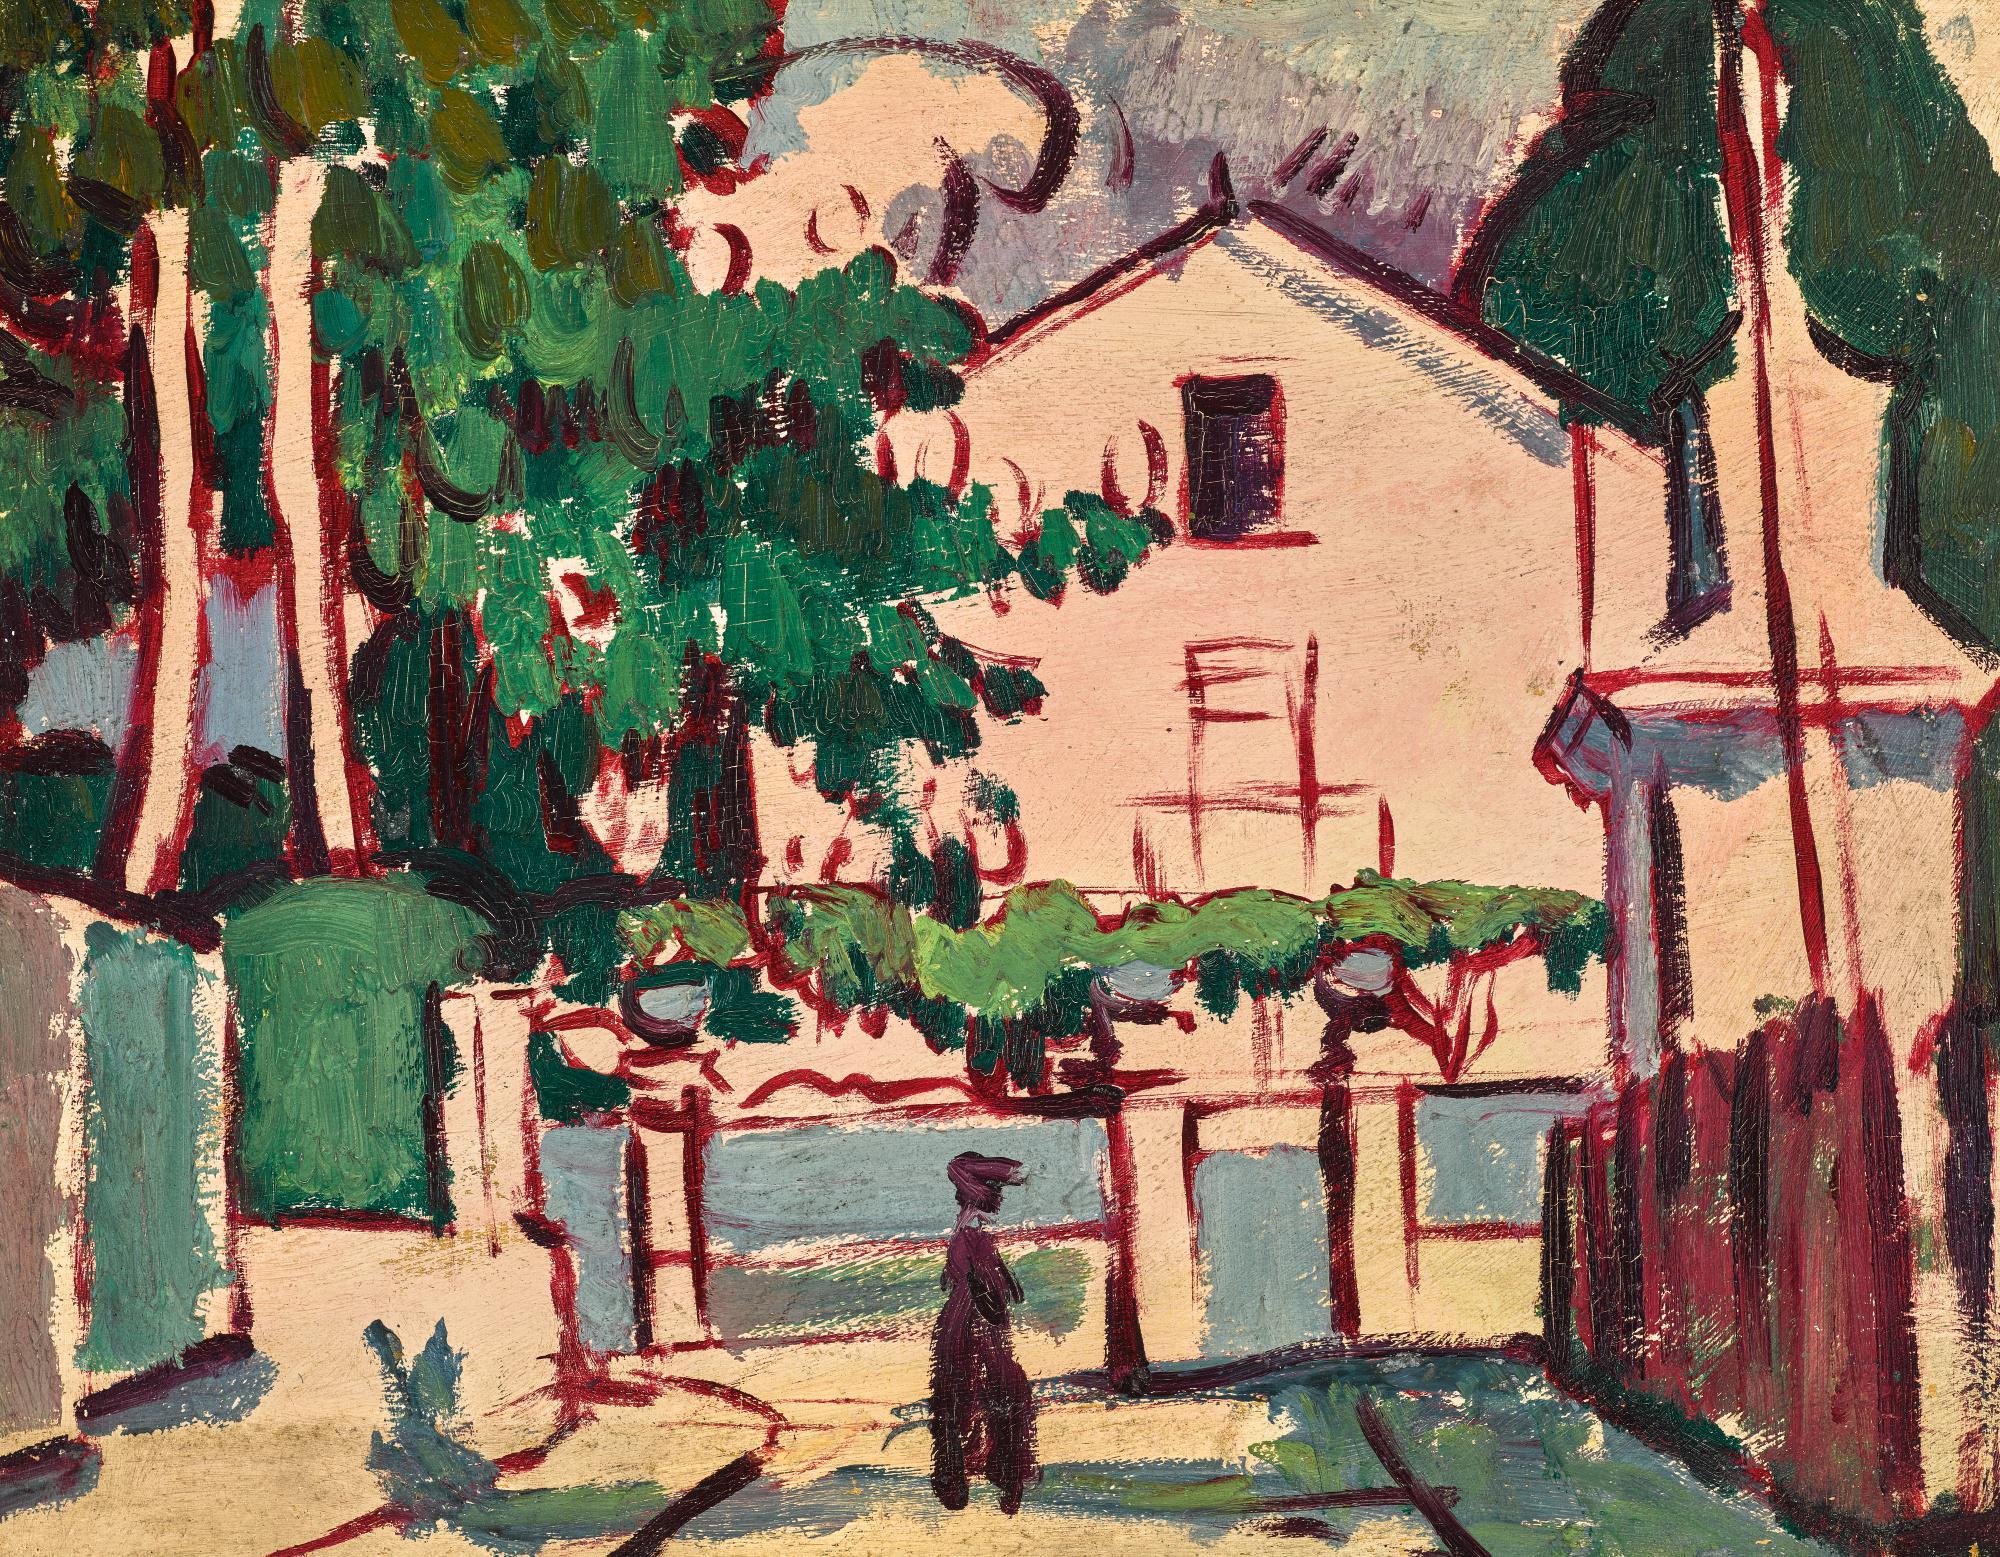 ANNE ESTELLE RICE | PINK HOUSE